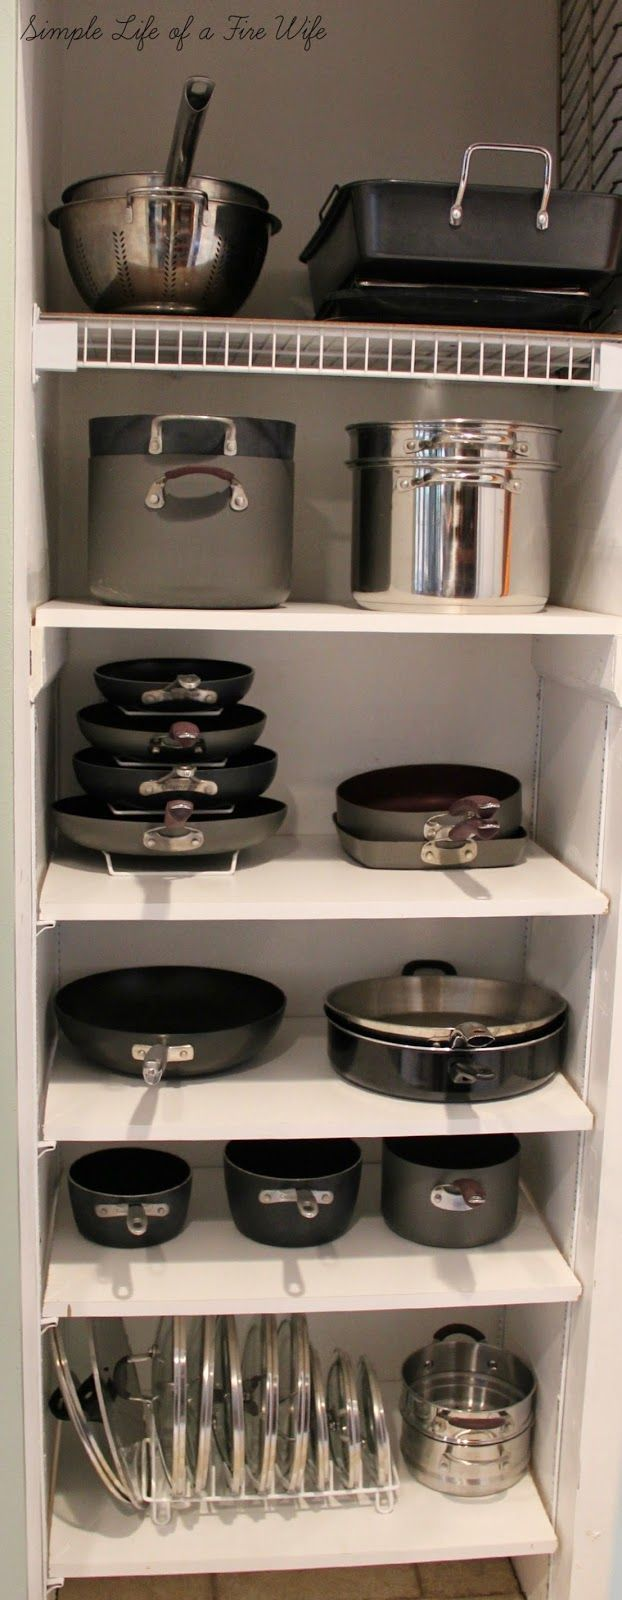 Kitchen Countertop Organization - | Countertop Organization, Home Goods and Industrial Farmhouse Kitchen